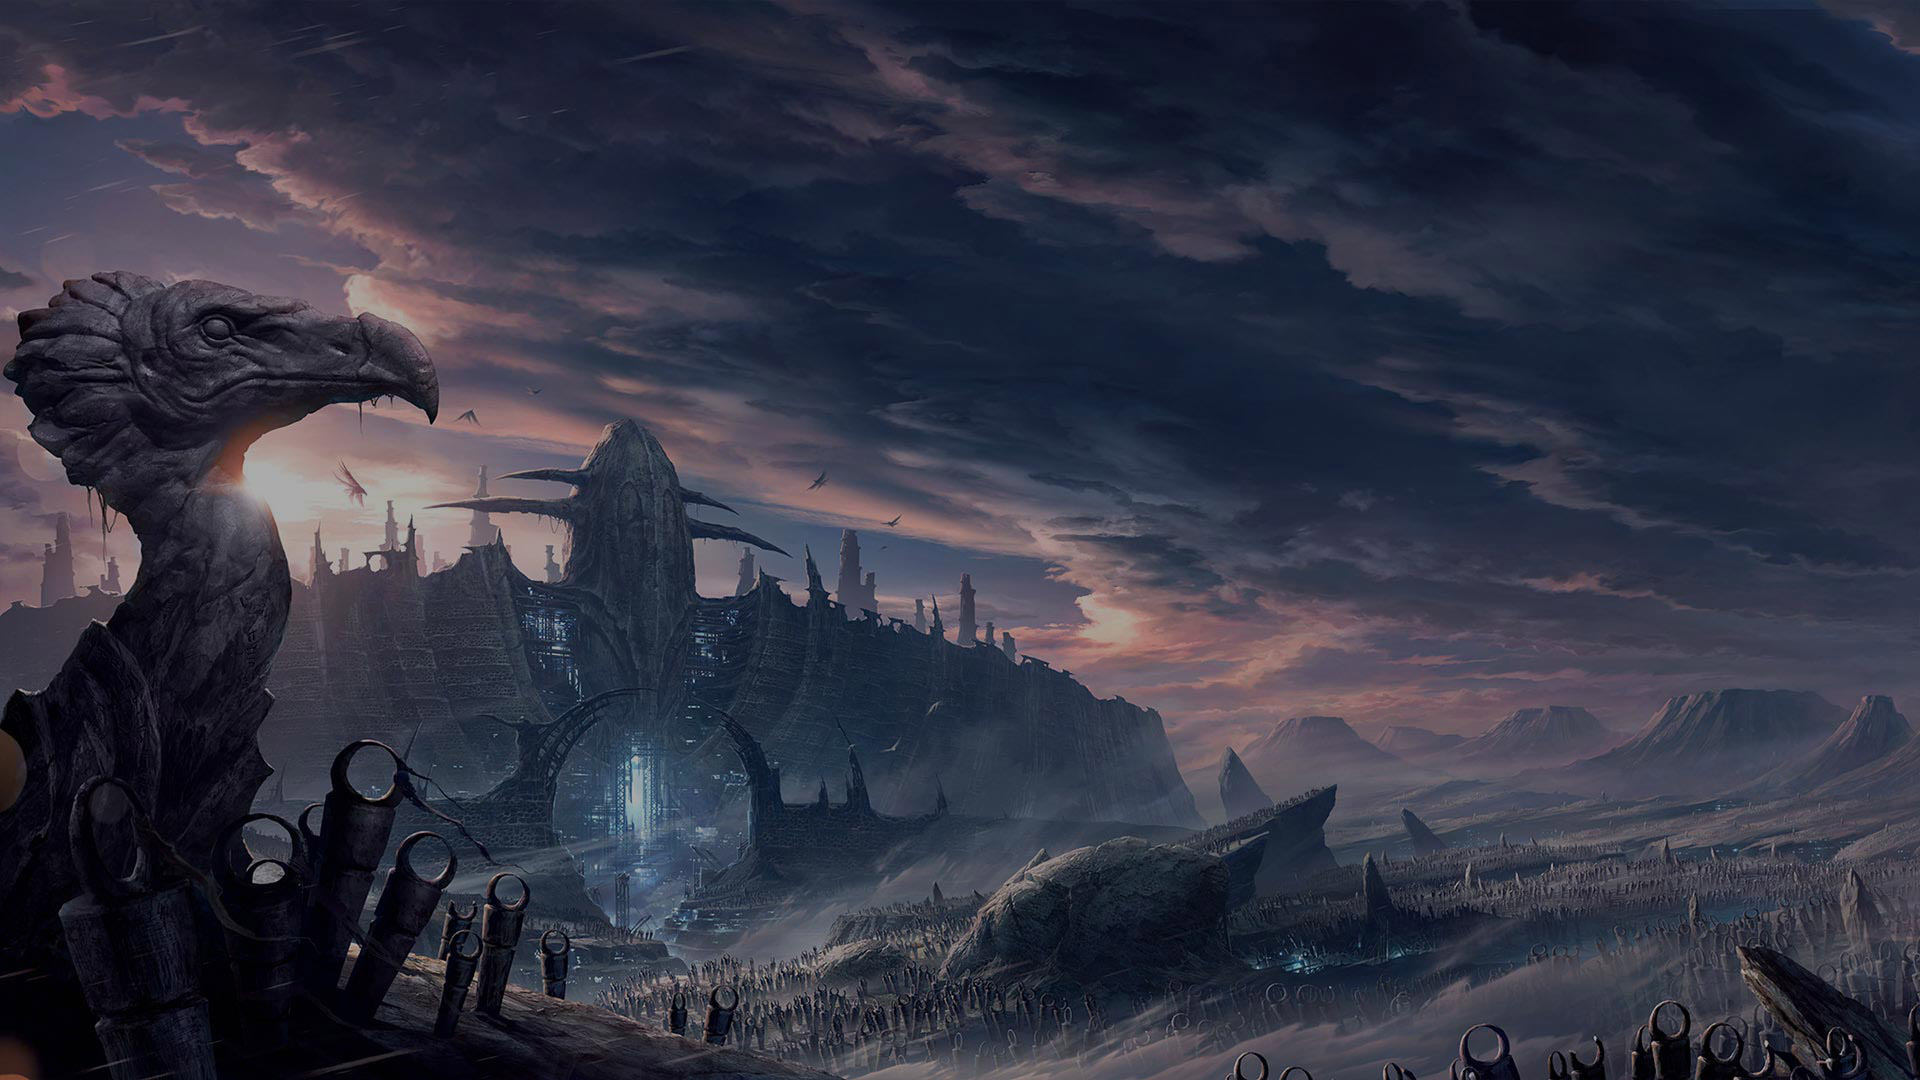 Oddworld: Soulstorm Wallpaper in 1920x1080